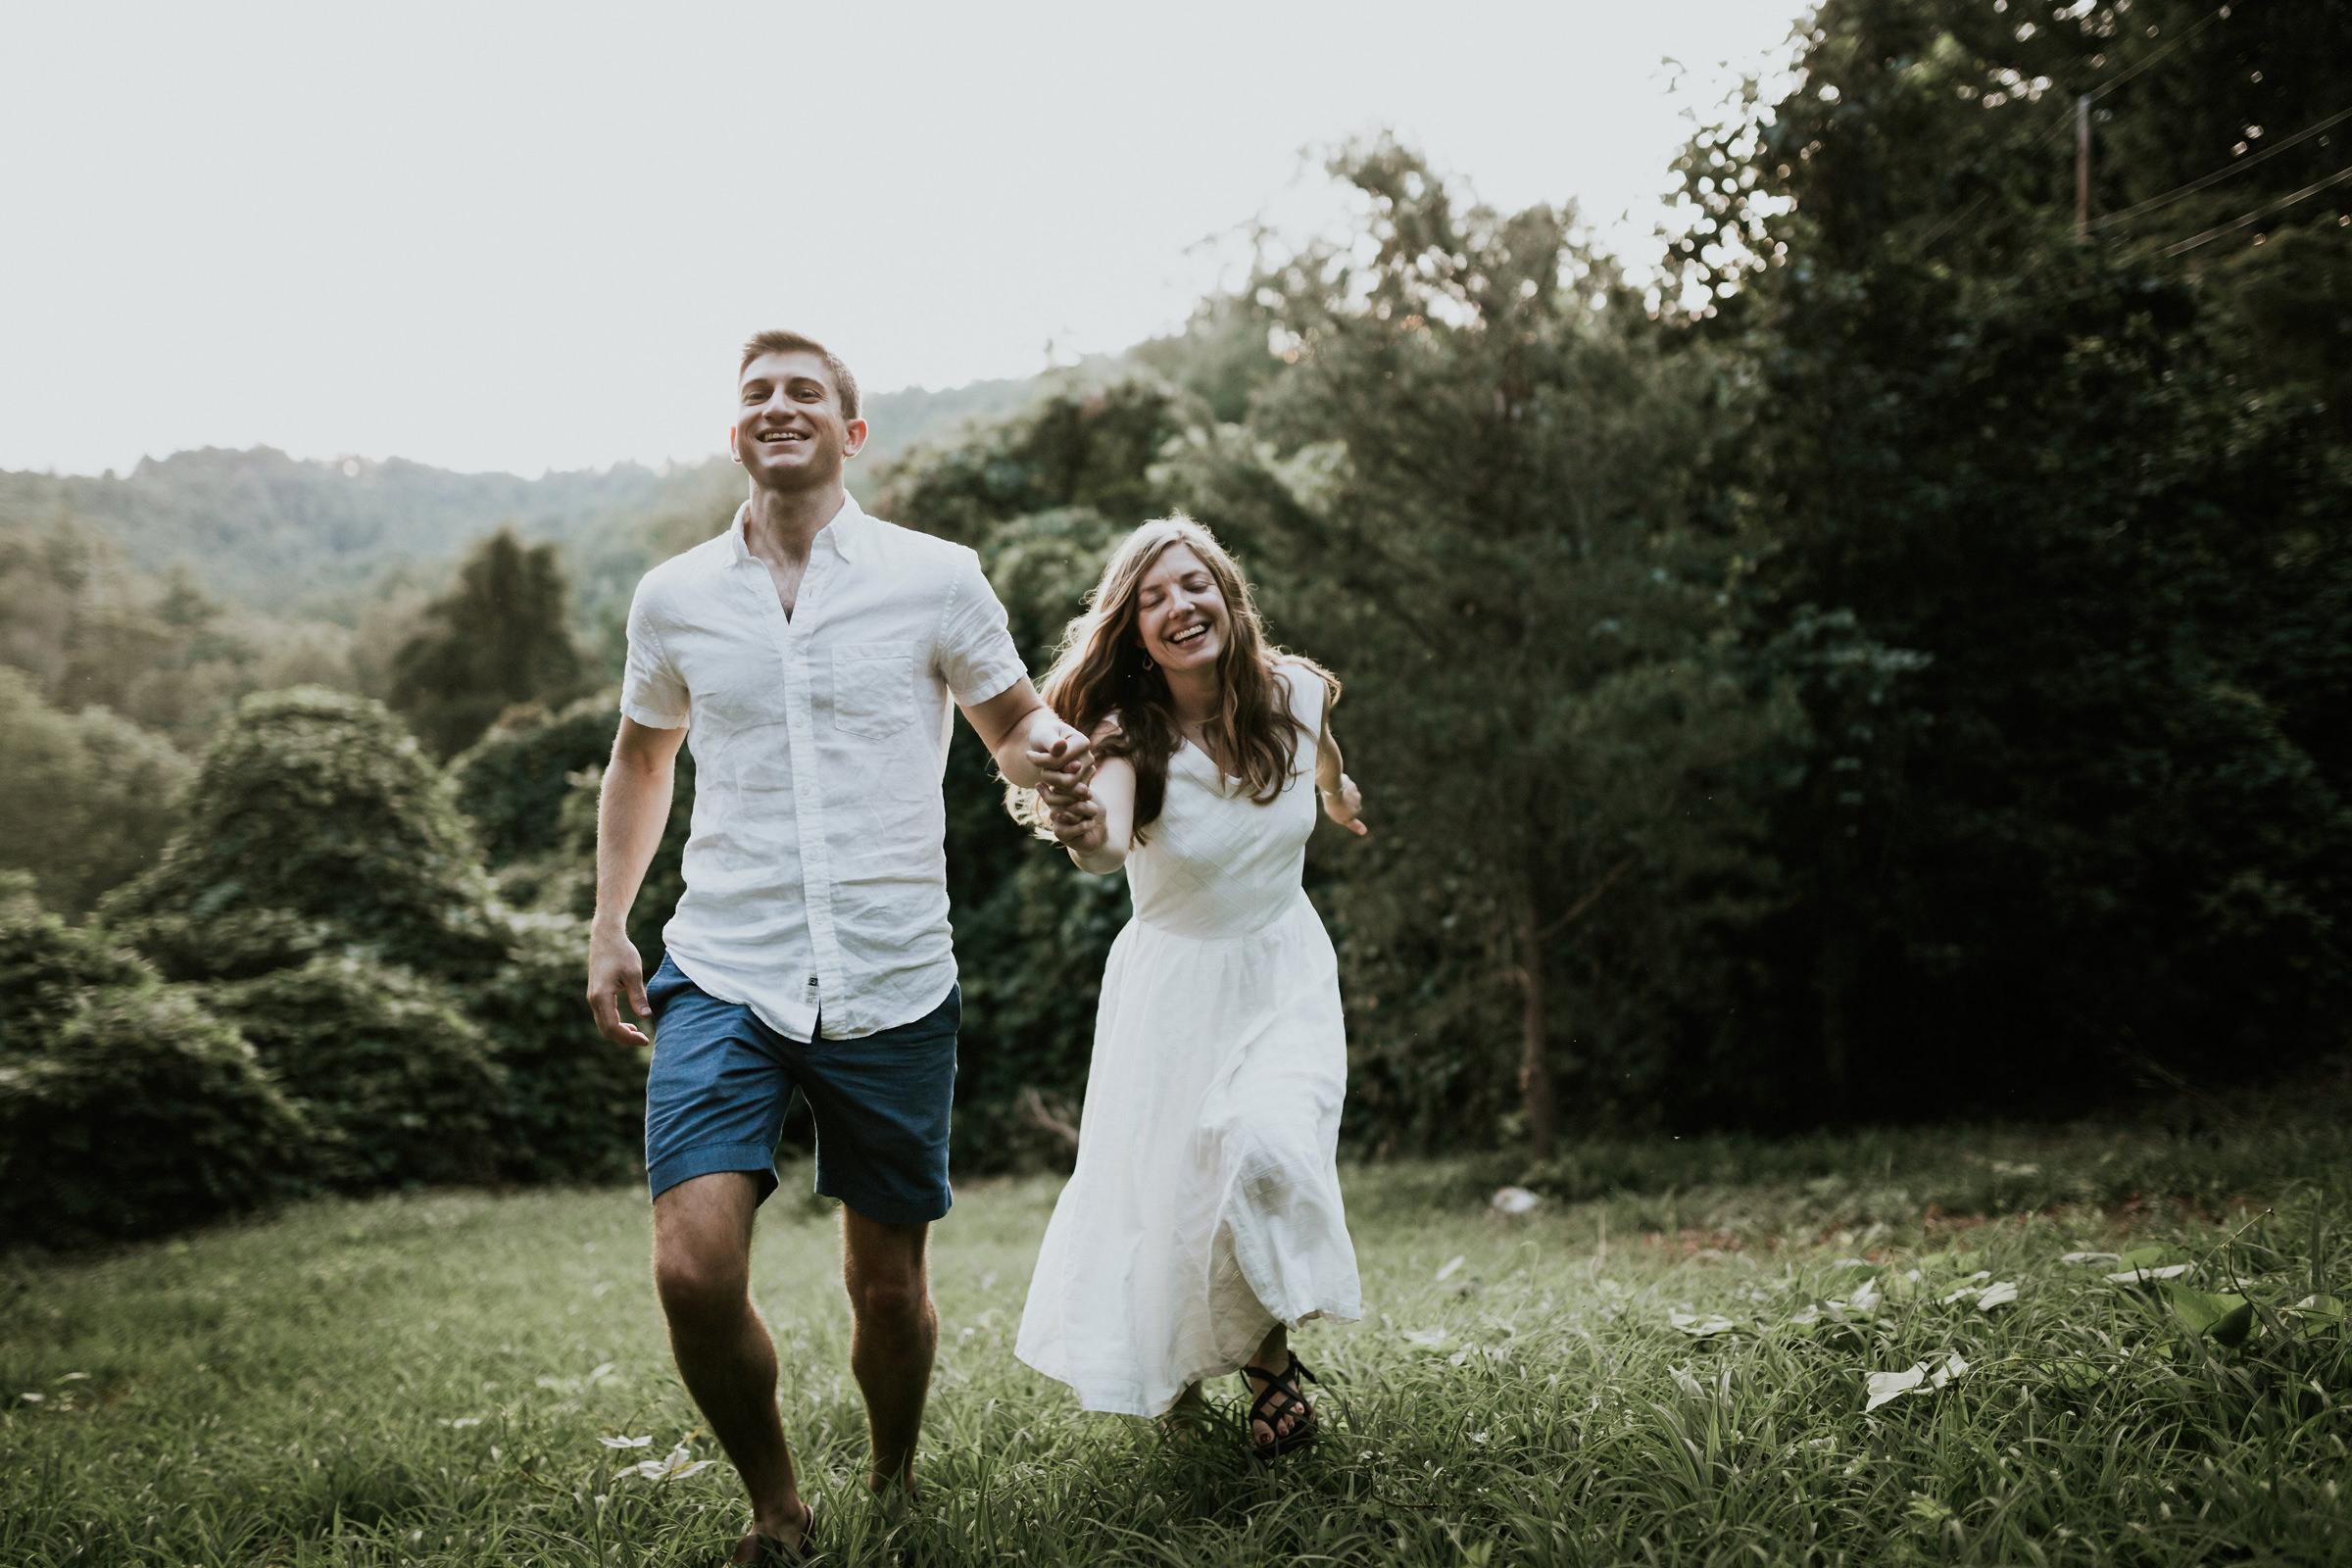 Kentucky_Candid_Wedding_Photographer_139.jpg